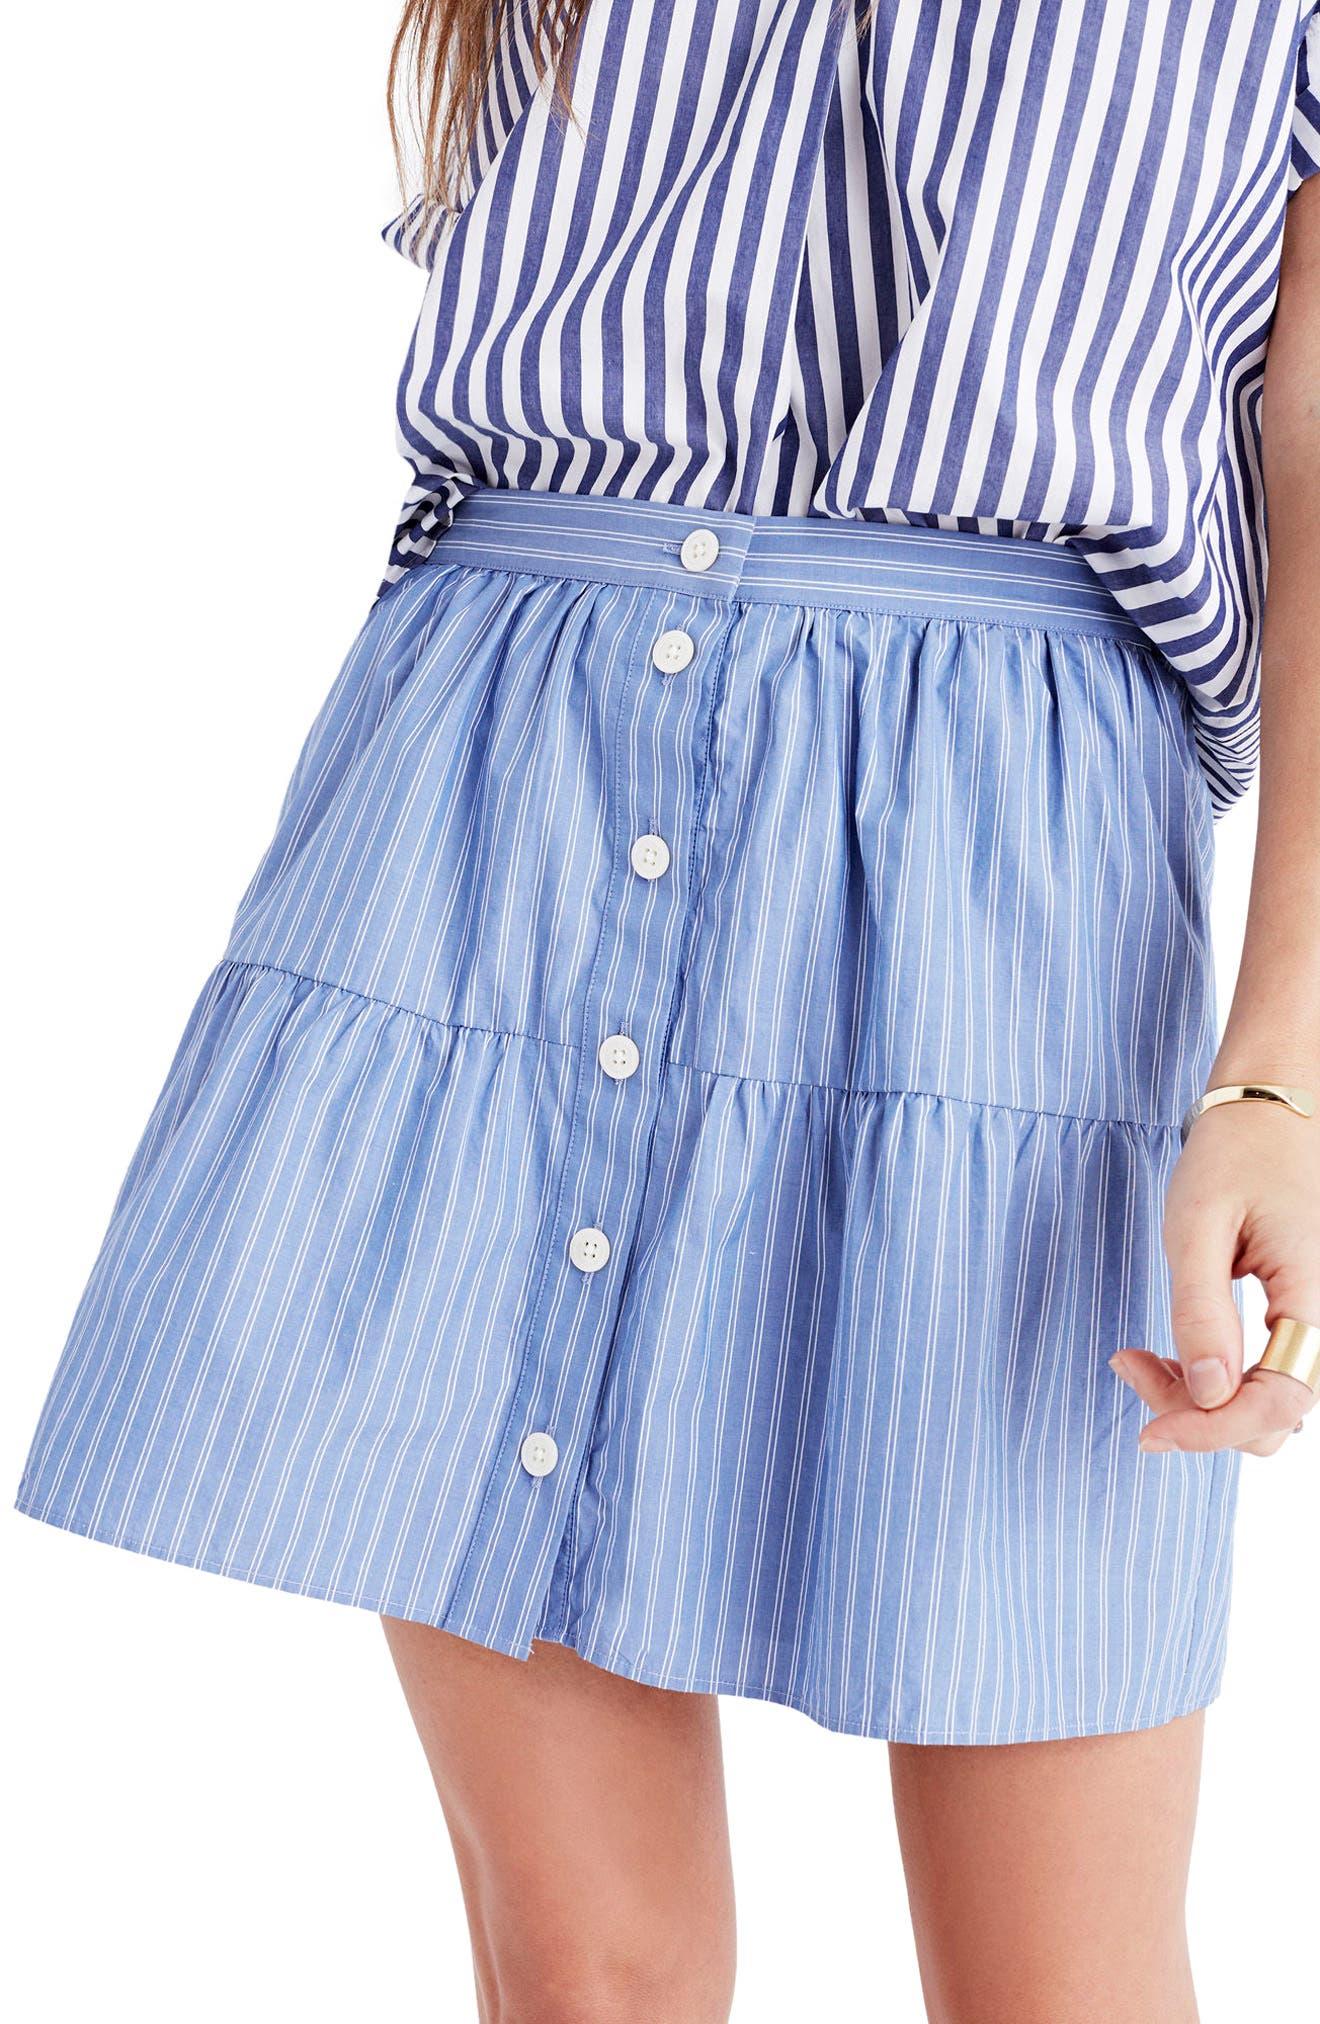 Alternate Image 1 Selected - Madewell Bistro Stripe Miniskirt